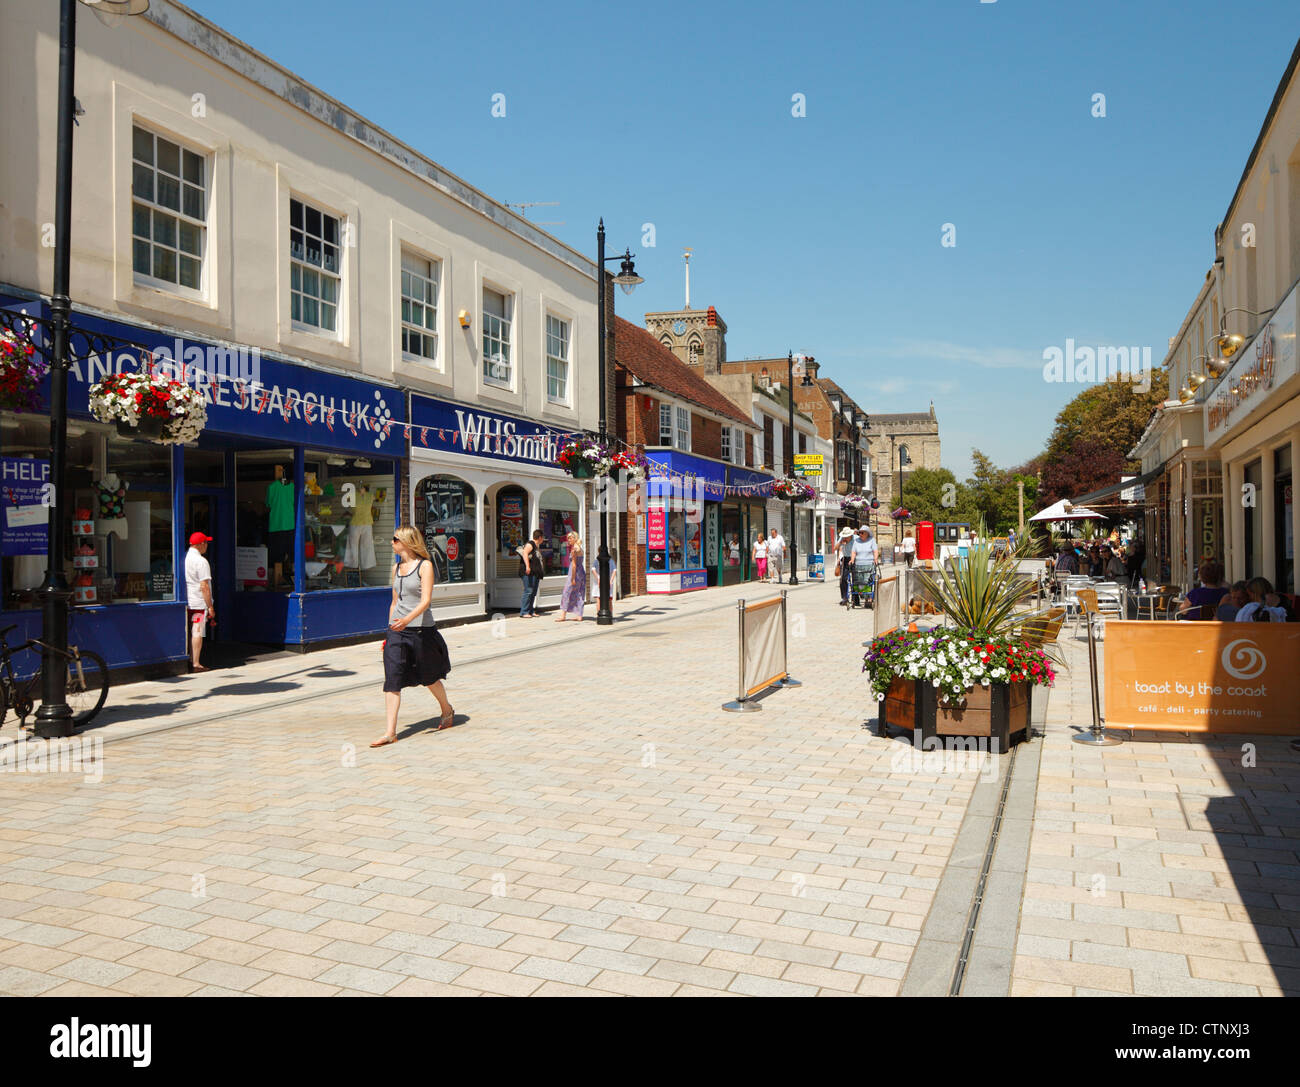 East Street, Shoreham by sea. - Stock Image